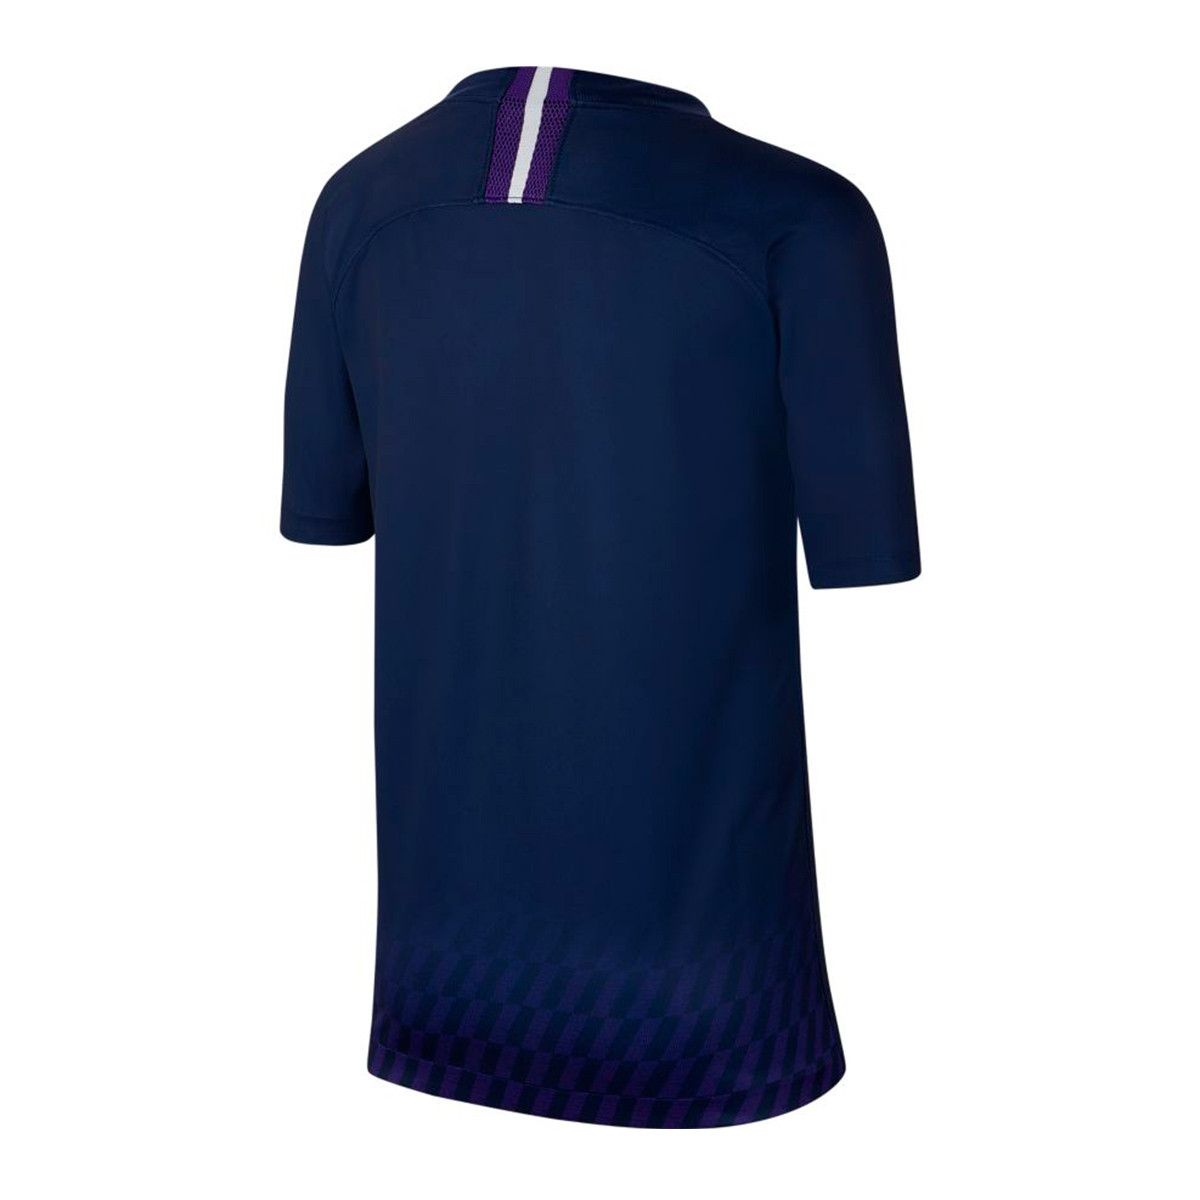 Jersey Nike Kids Tottenham Hotspur Breathe Stadium 2019 2020 Away Binary Blue White Football Store Futbol Emotion